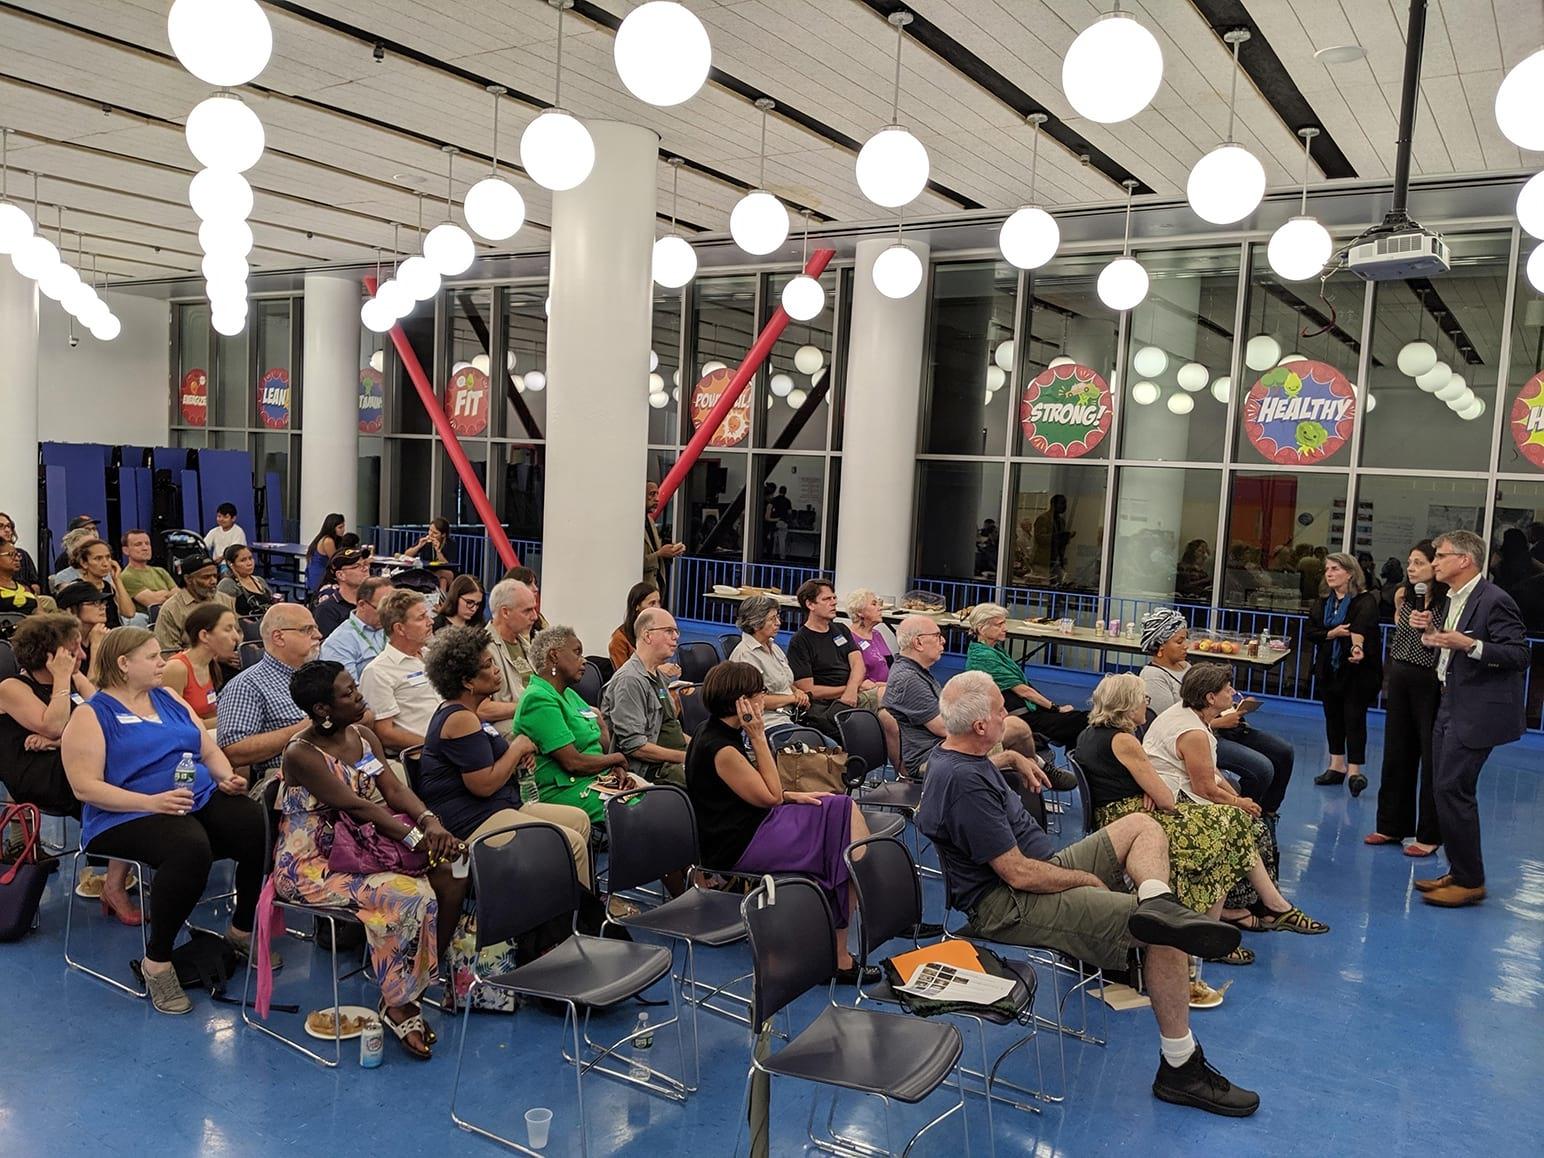 Community meeting at the Harlem Children's Zone